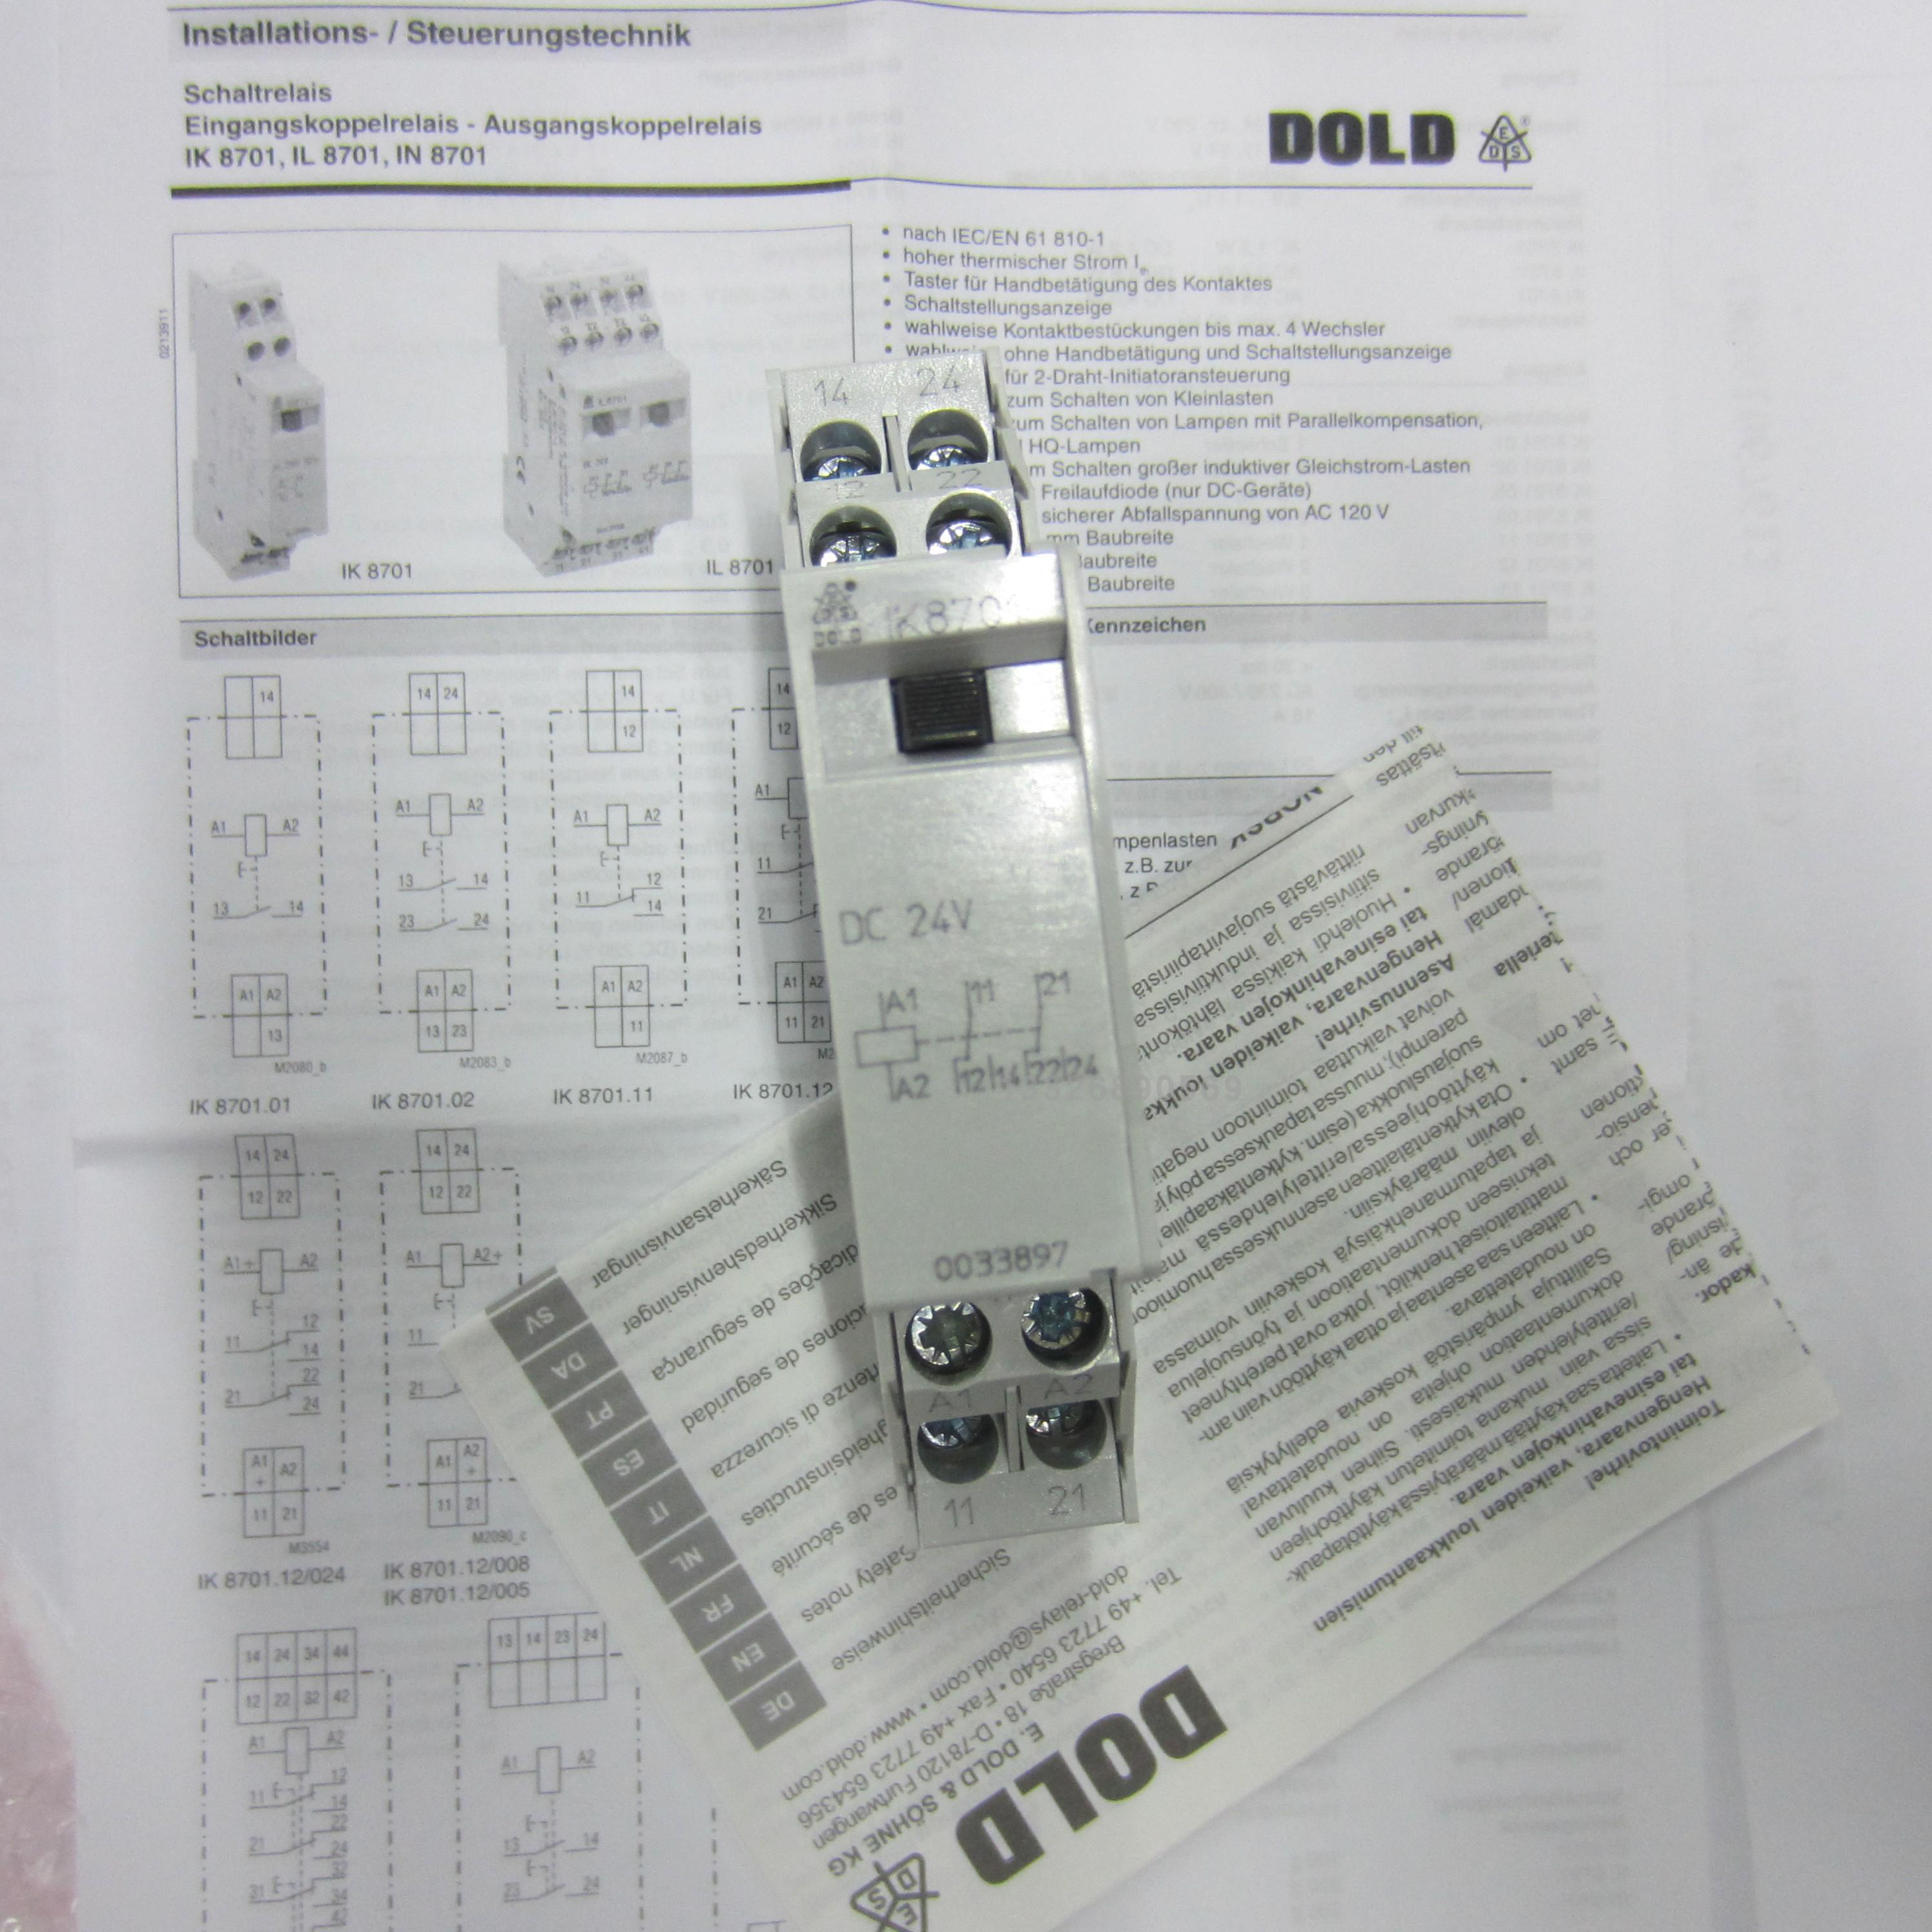 Dold ik8701.12 AC 24 V 50 Hz 0033894 Boutons relais-UNUSED//Neuf dans sa boîte E